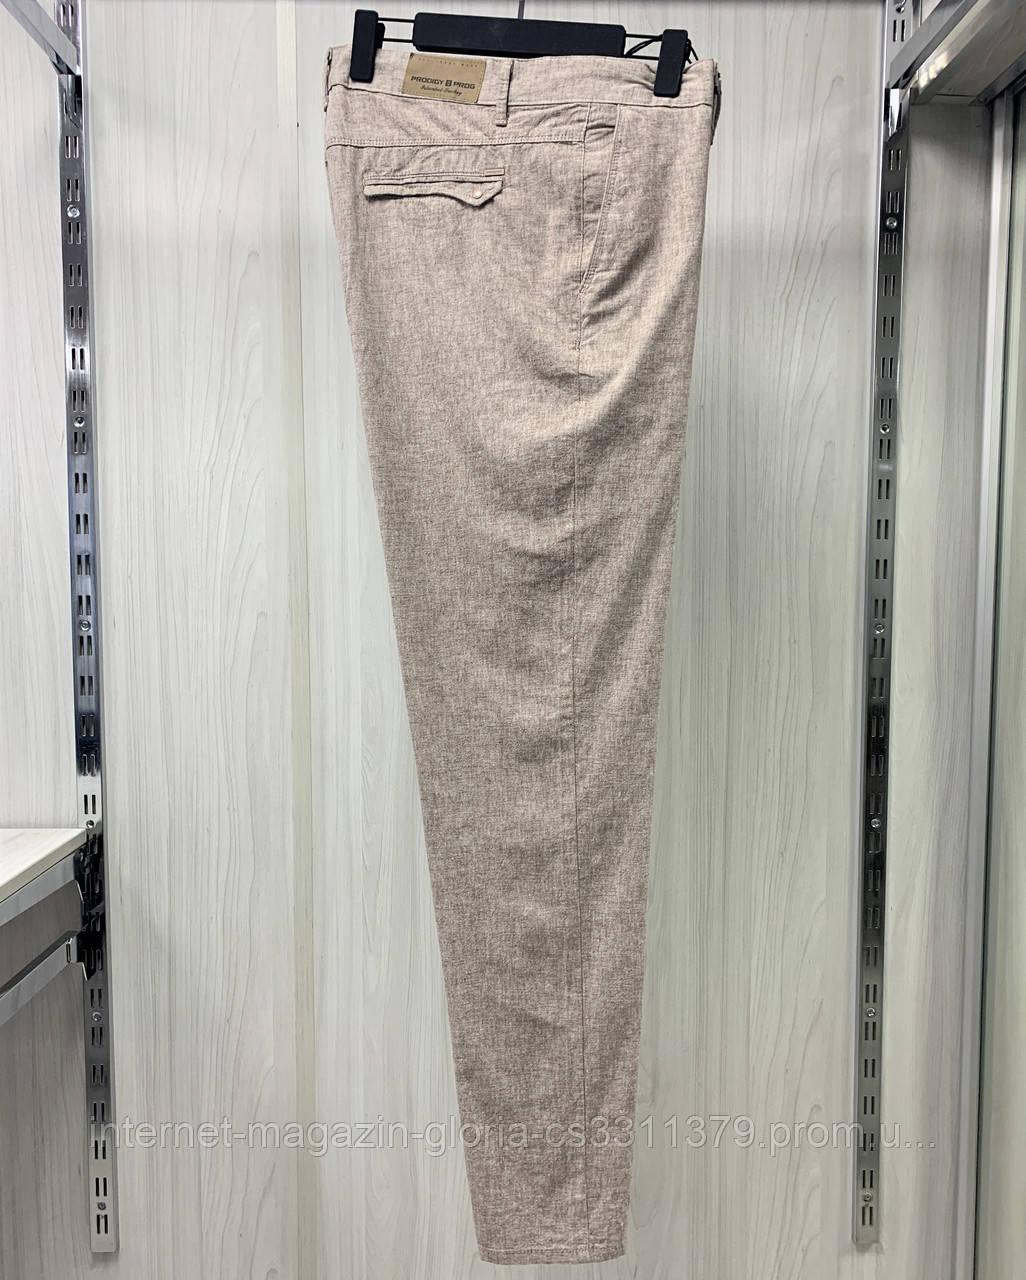 Мужские брюки Prodigy. Лён. (Linen 2060). Размеры: 33,34,35,36,38,40,42.